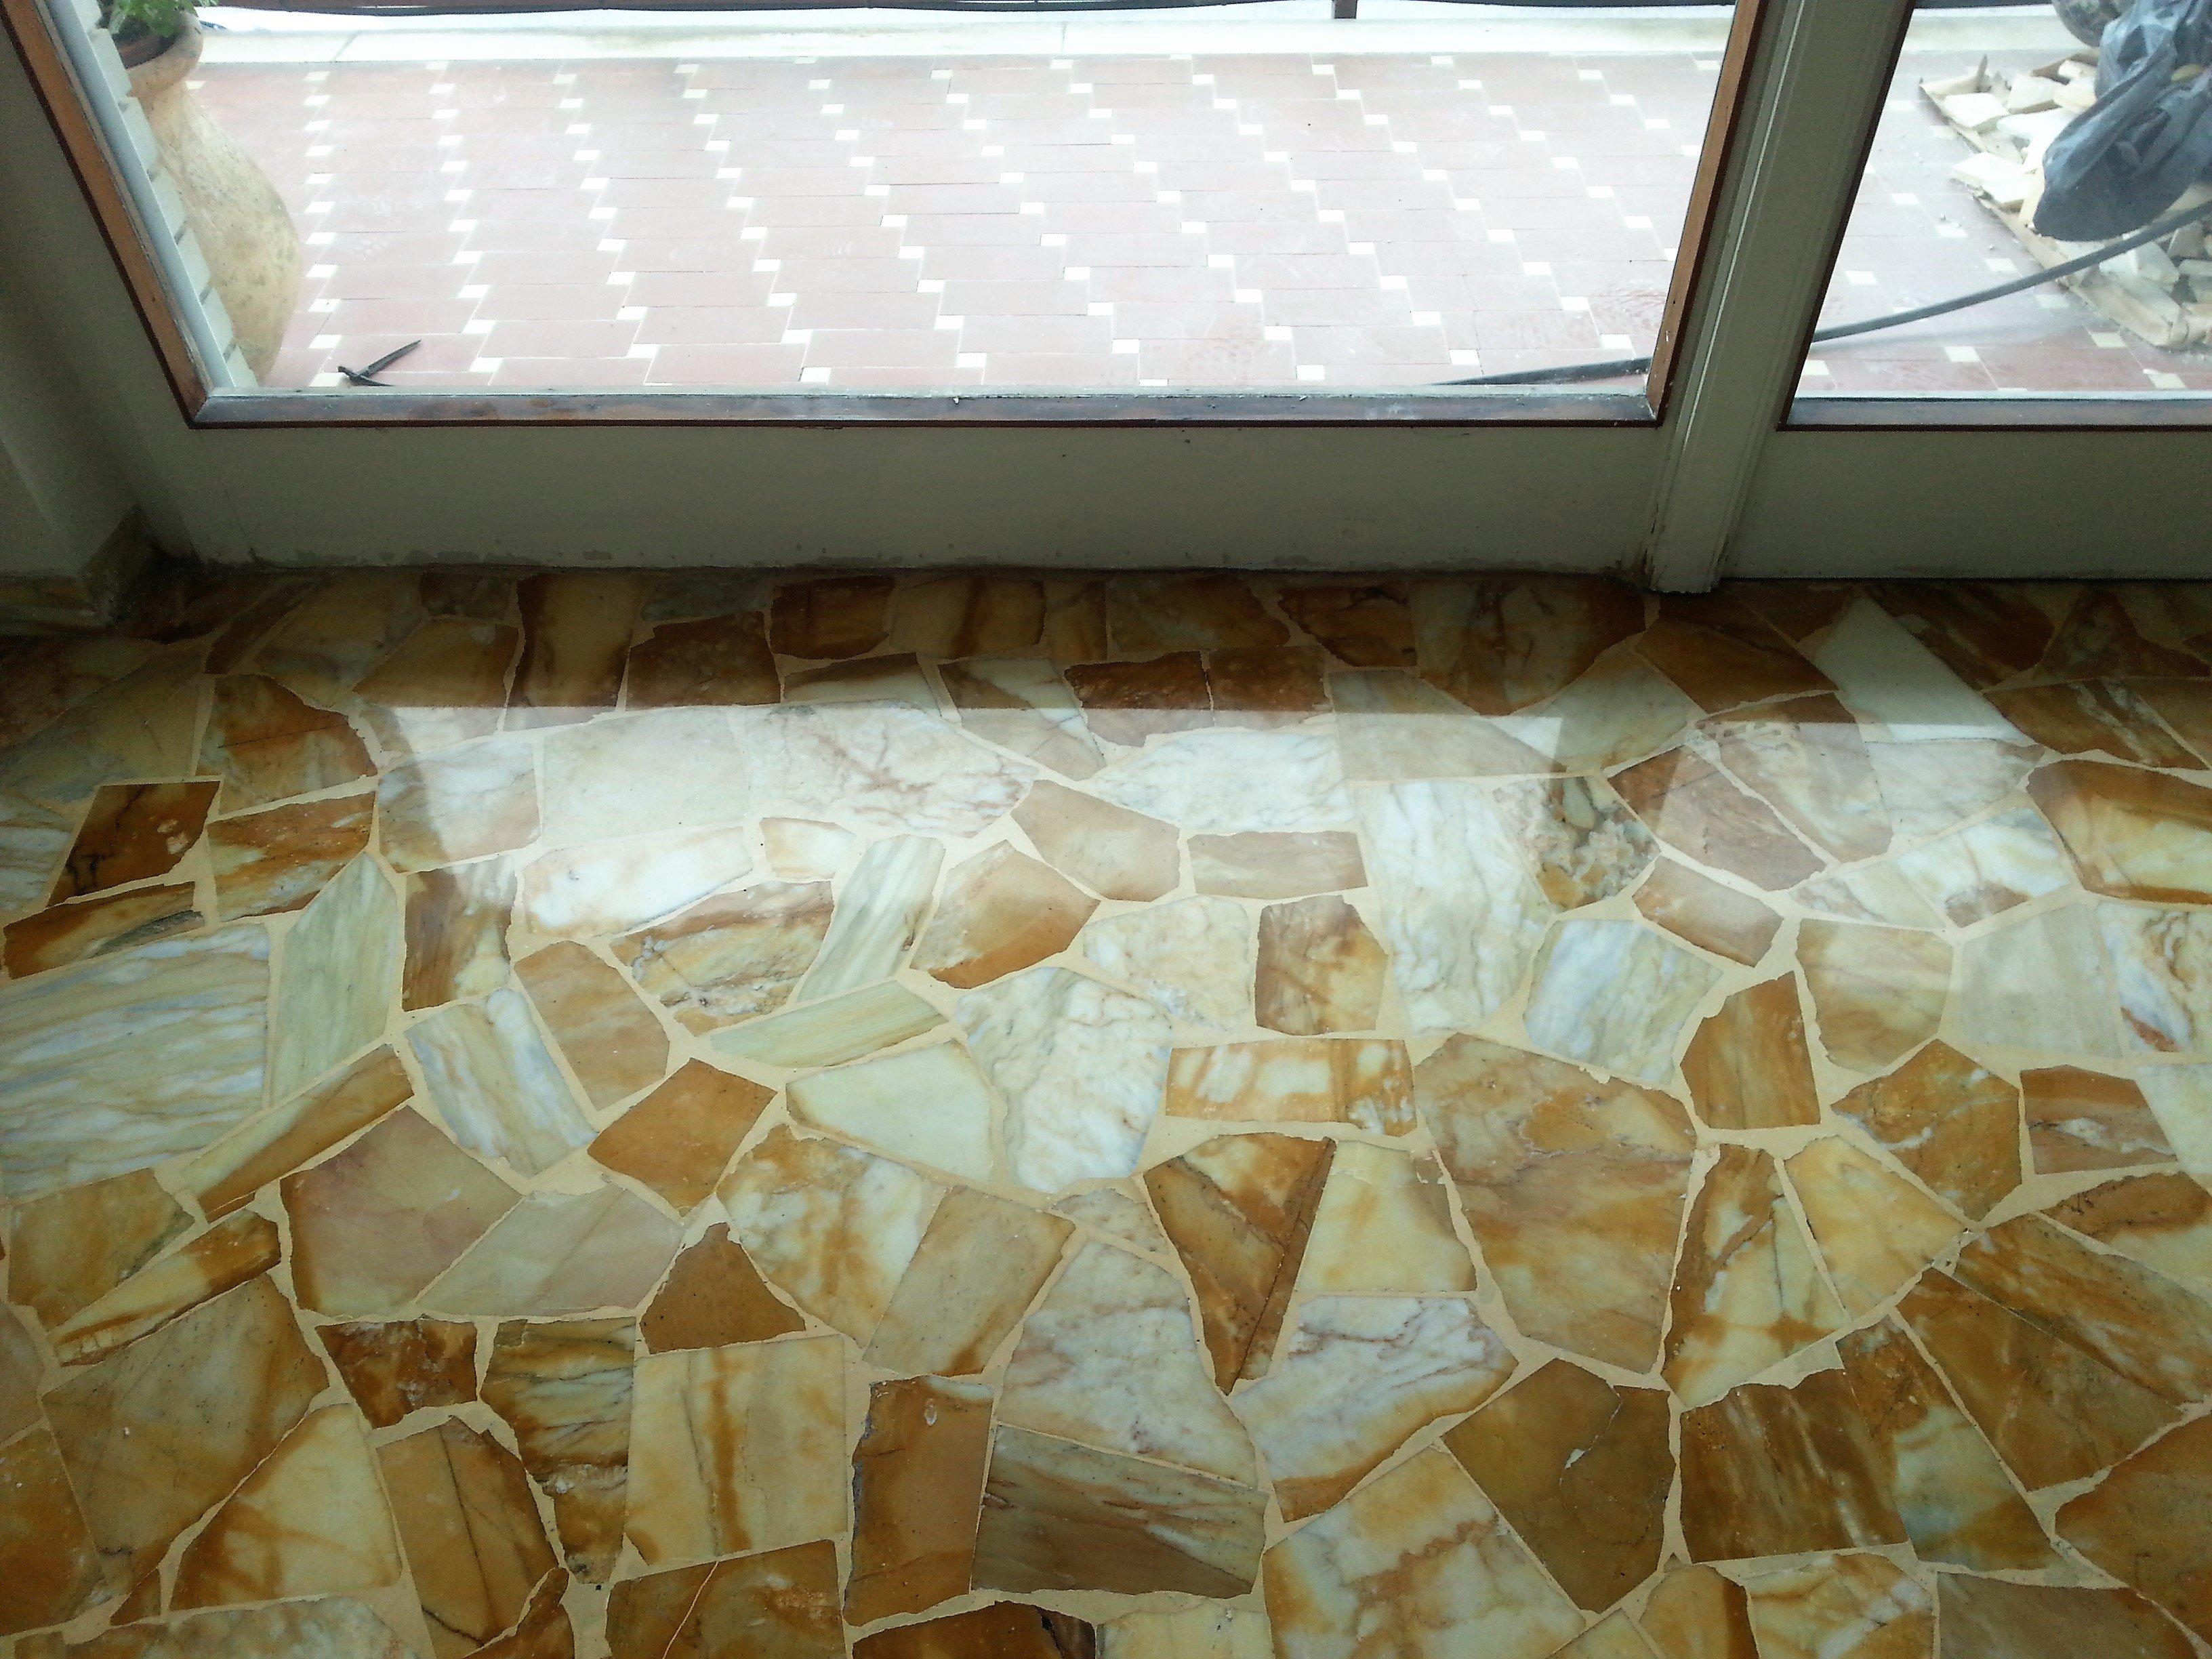 pavimento alla palladiana